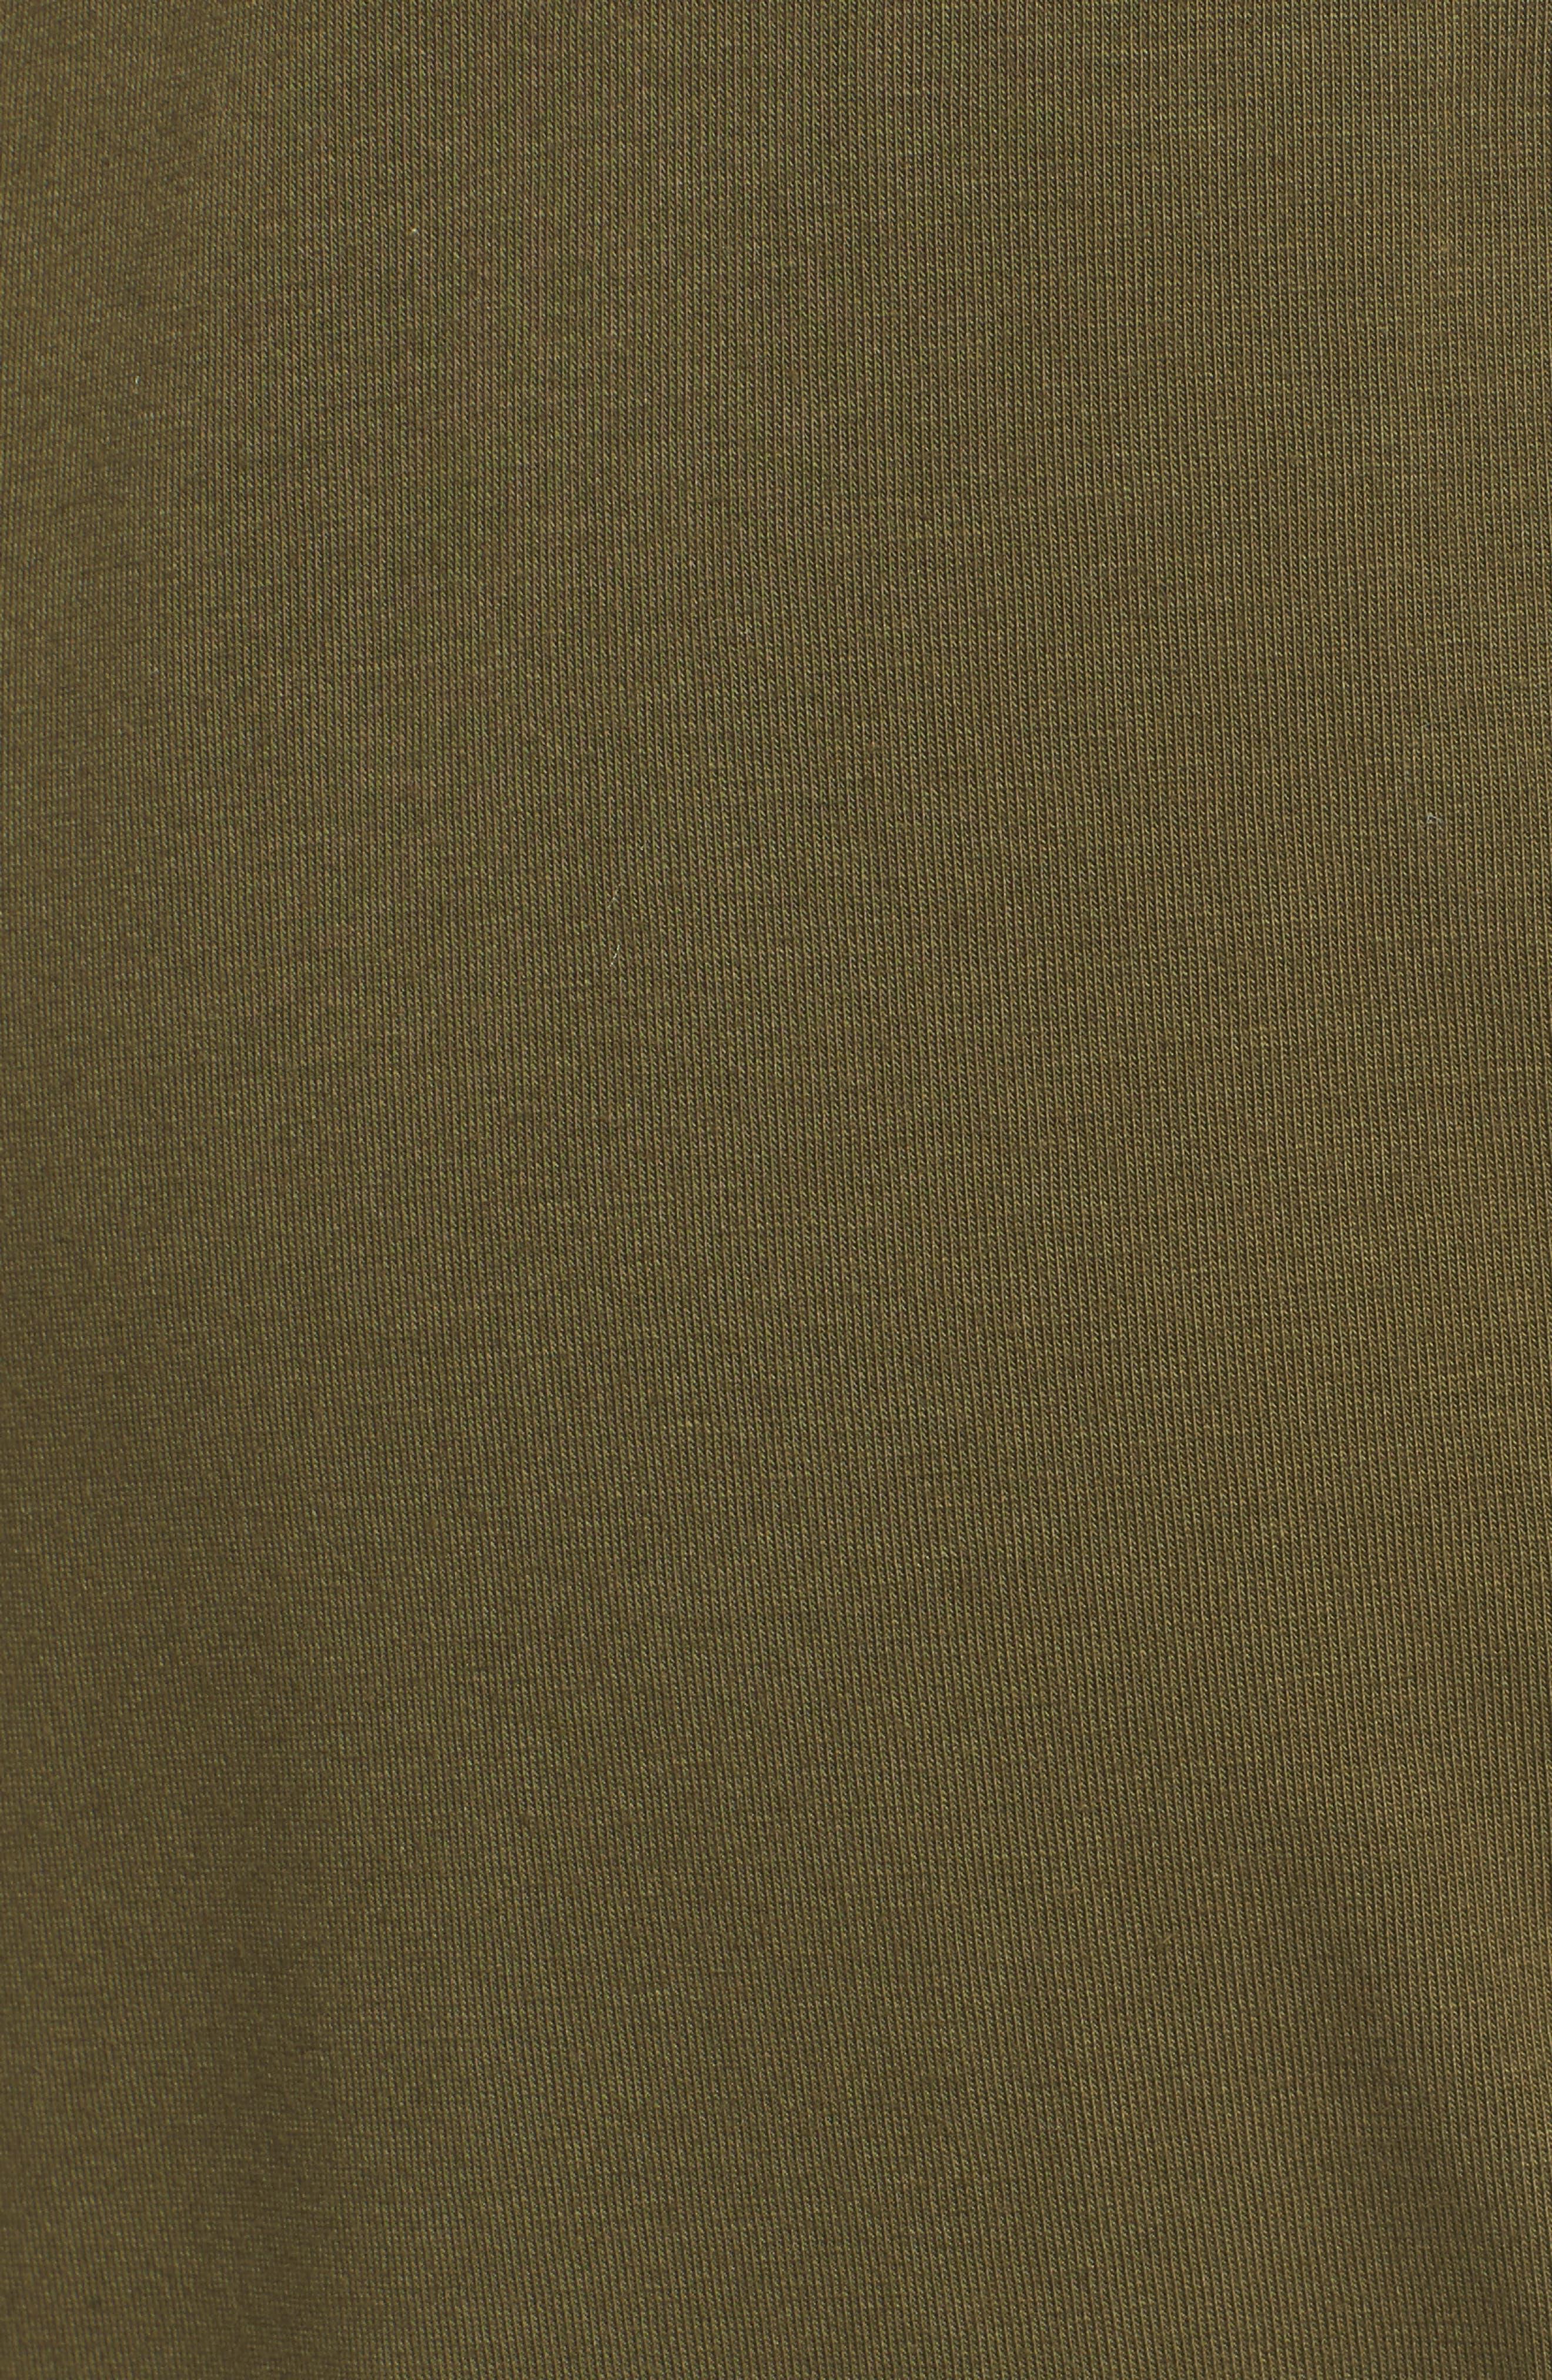 Alternate Image 5  - Eileen Fisher Stretch Organic Cotton Slim Slouchy Ankle Pants (Regular & Petite)